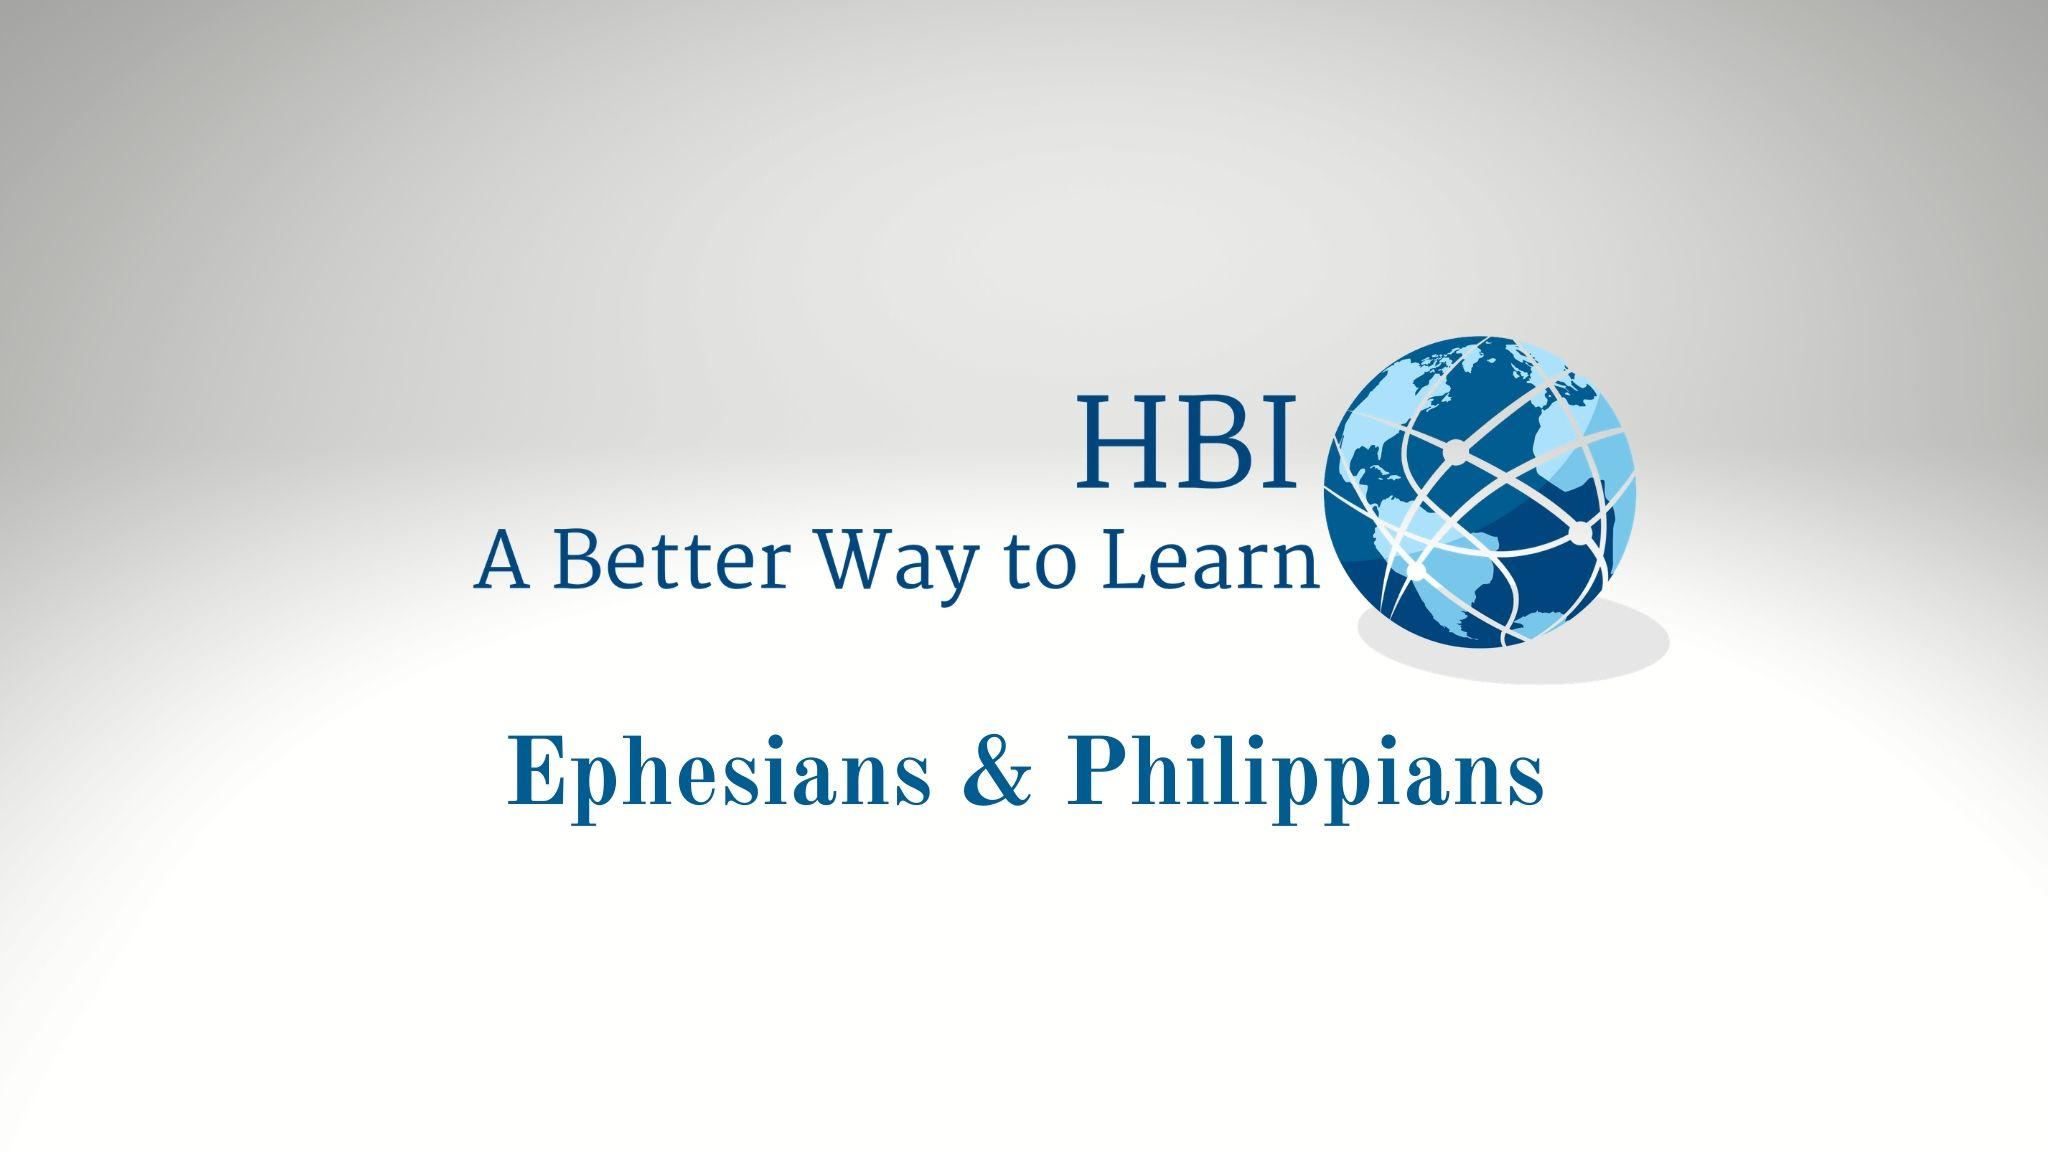 Ephesians and Philippians